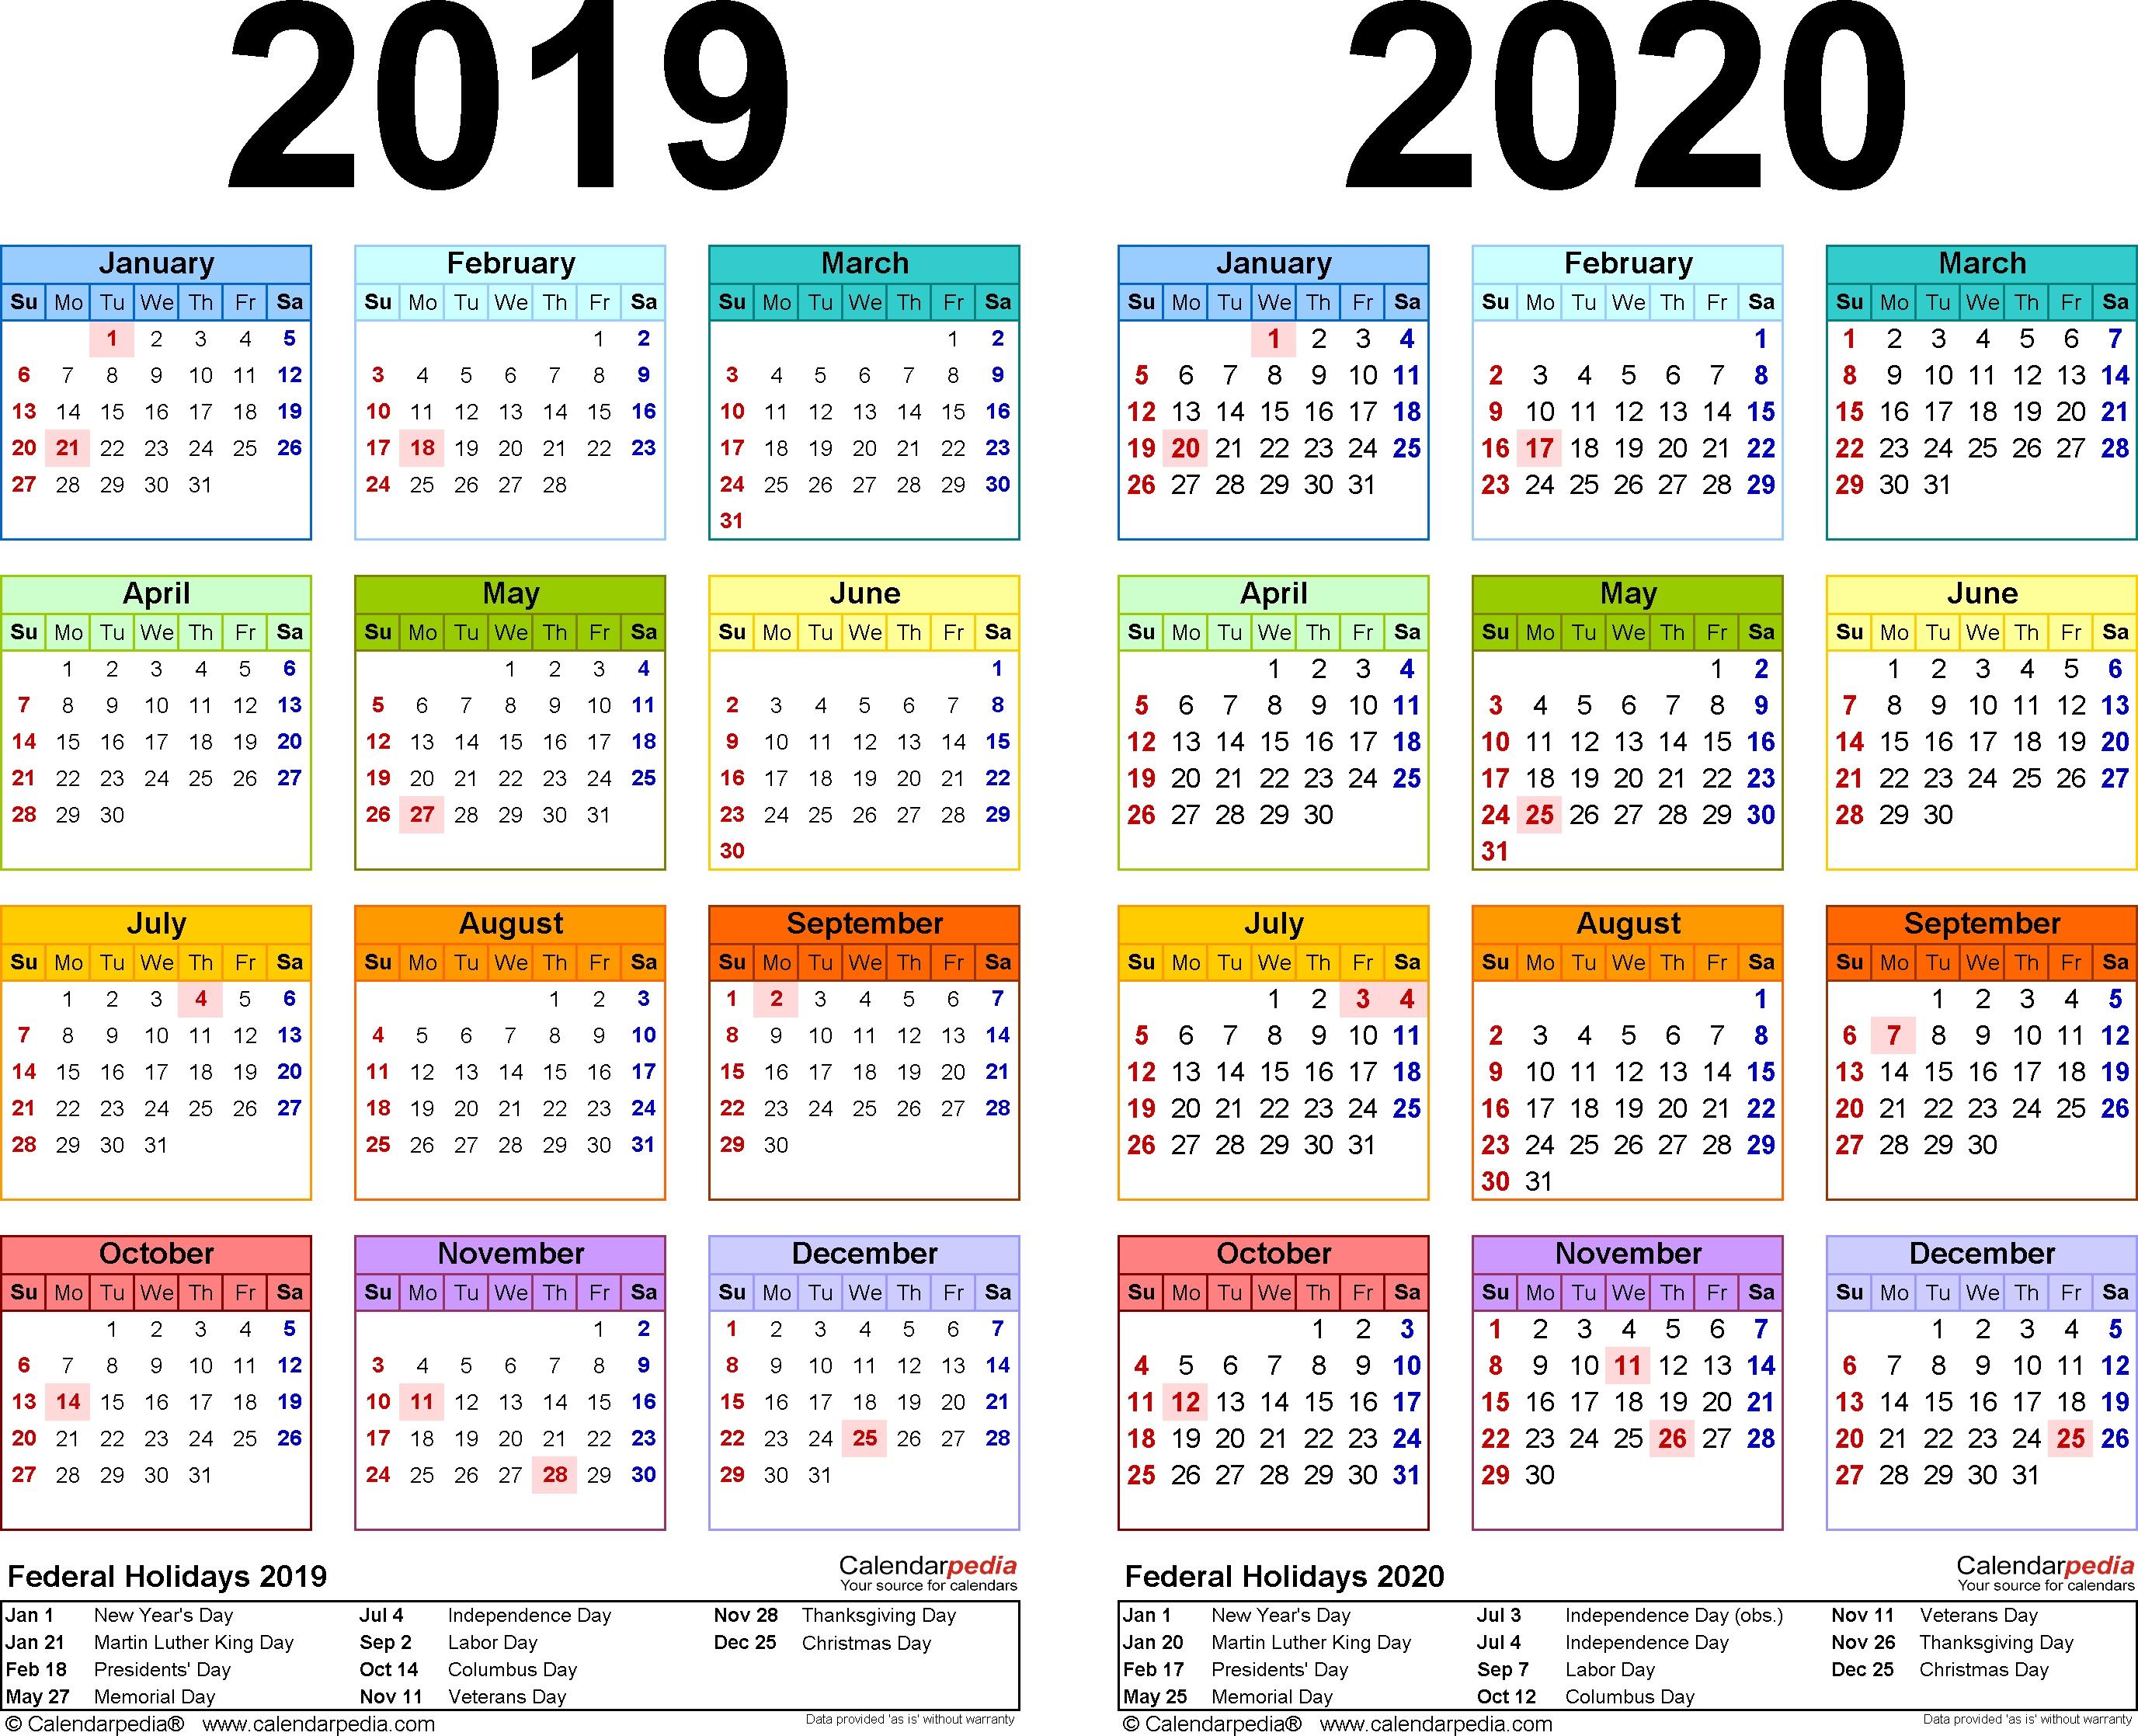 2019-2020 Calendar - Free Printable Two-Year Pdf Calendars in Free Printable Calendar 2019-2020